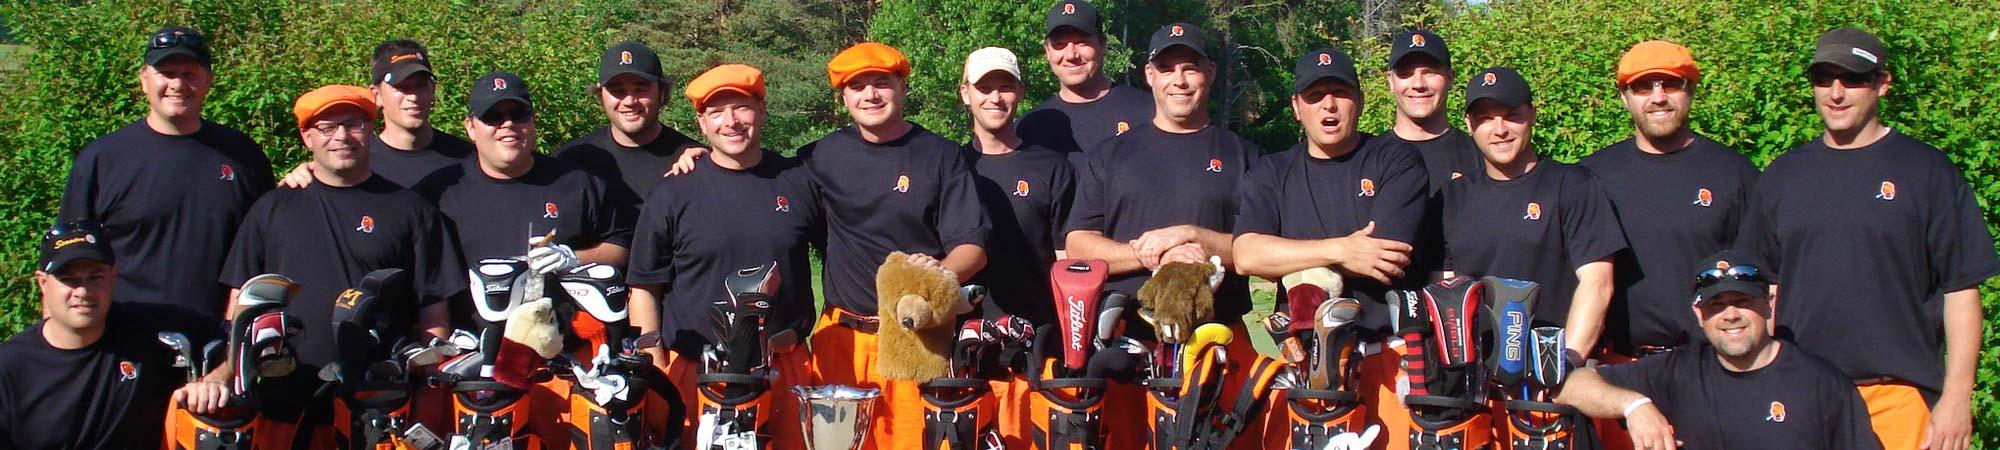 slide-golf-Golf_group_2000x450